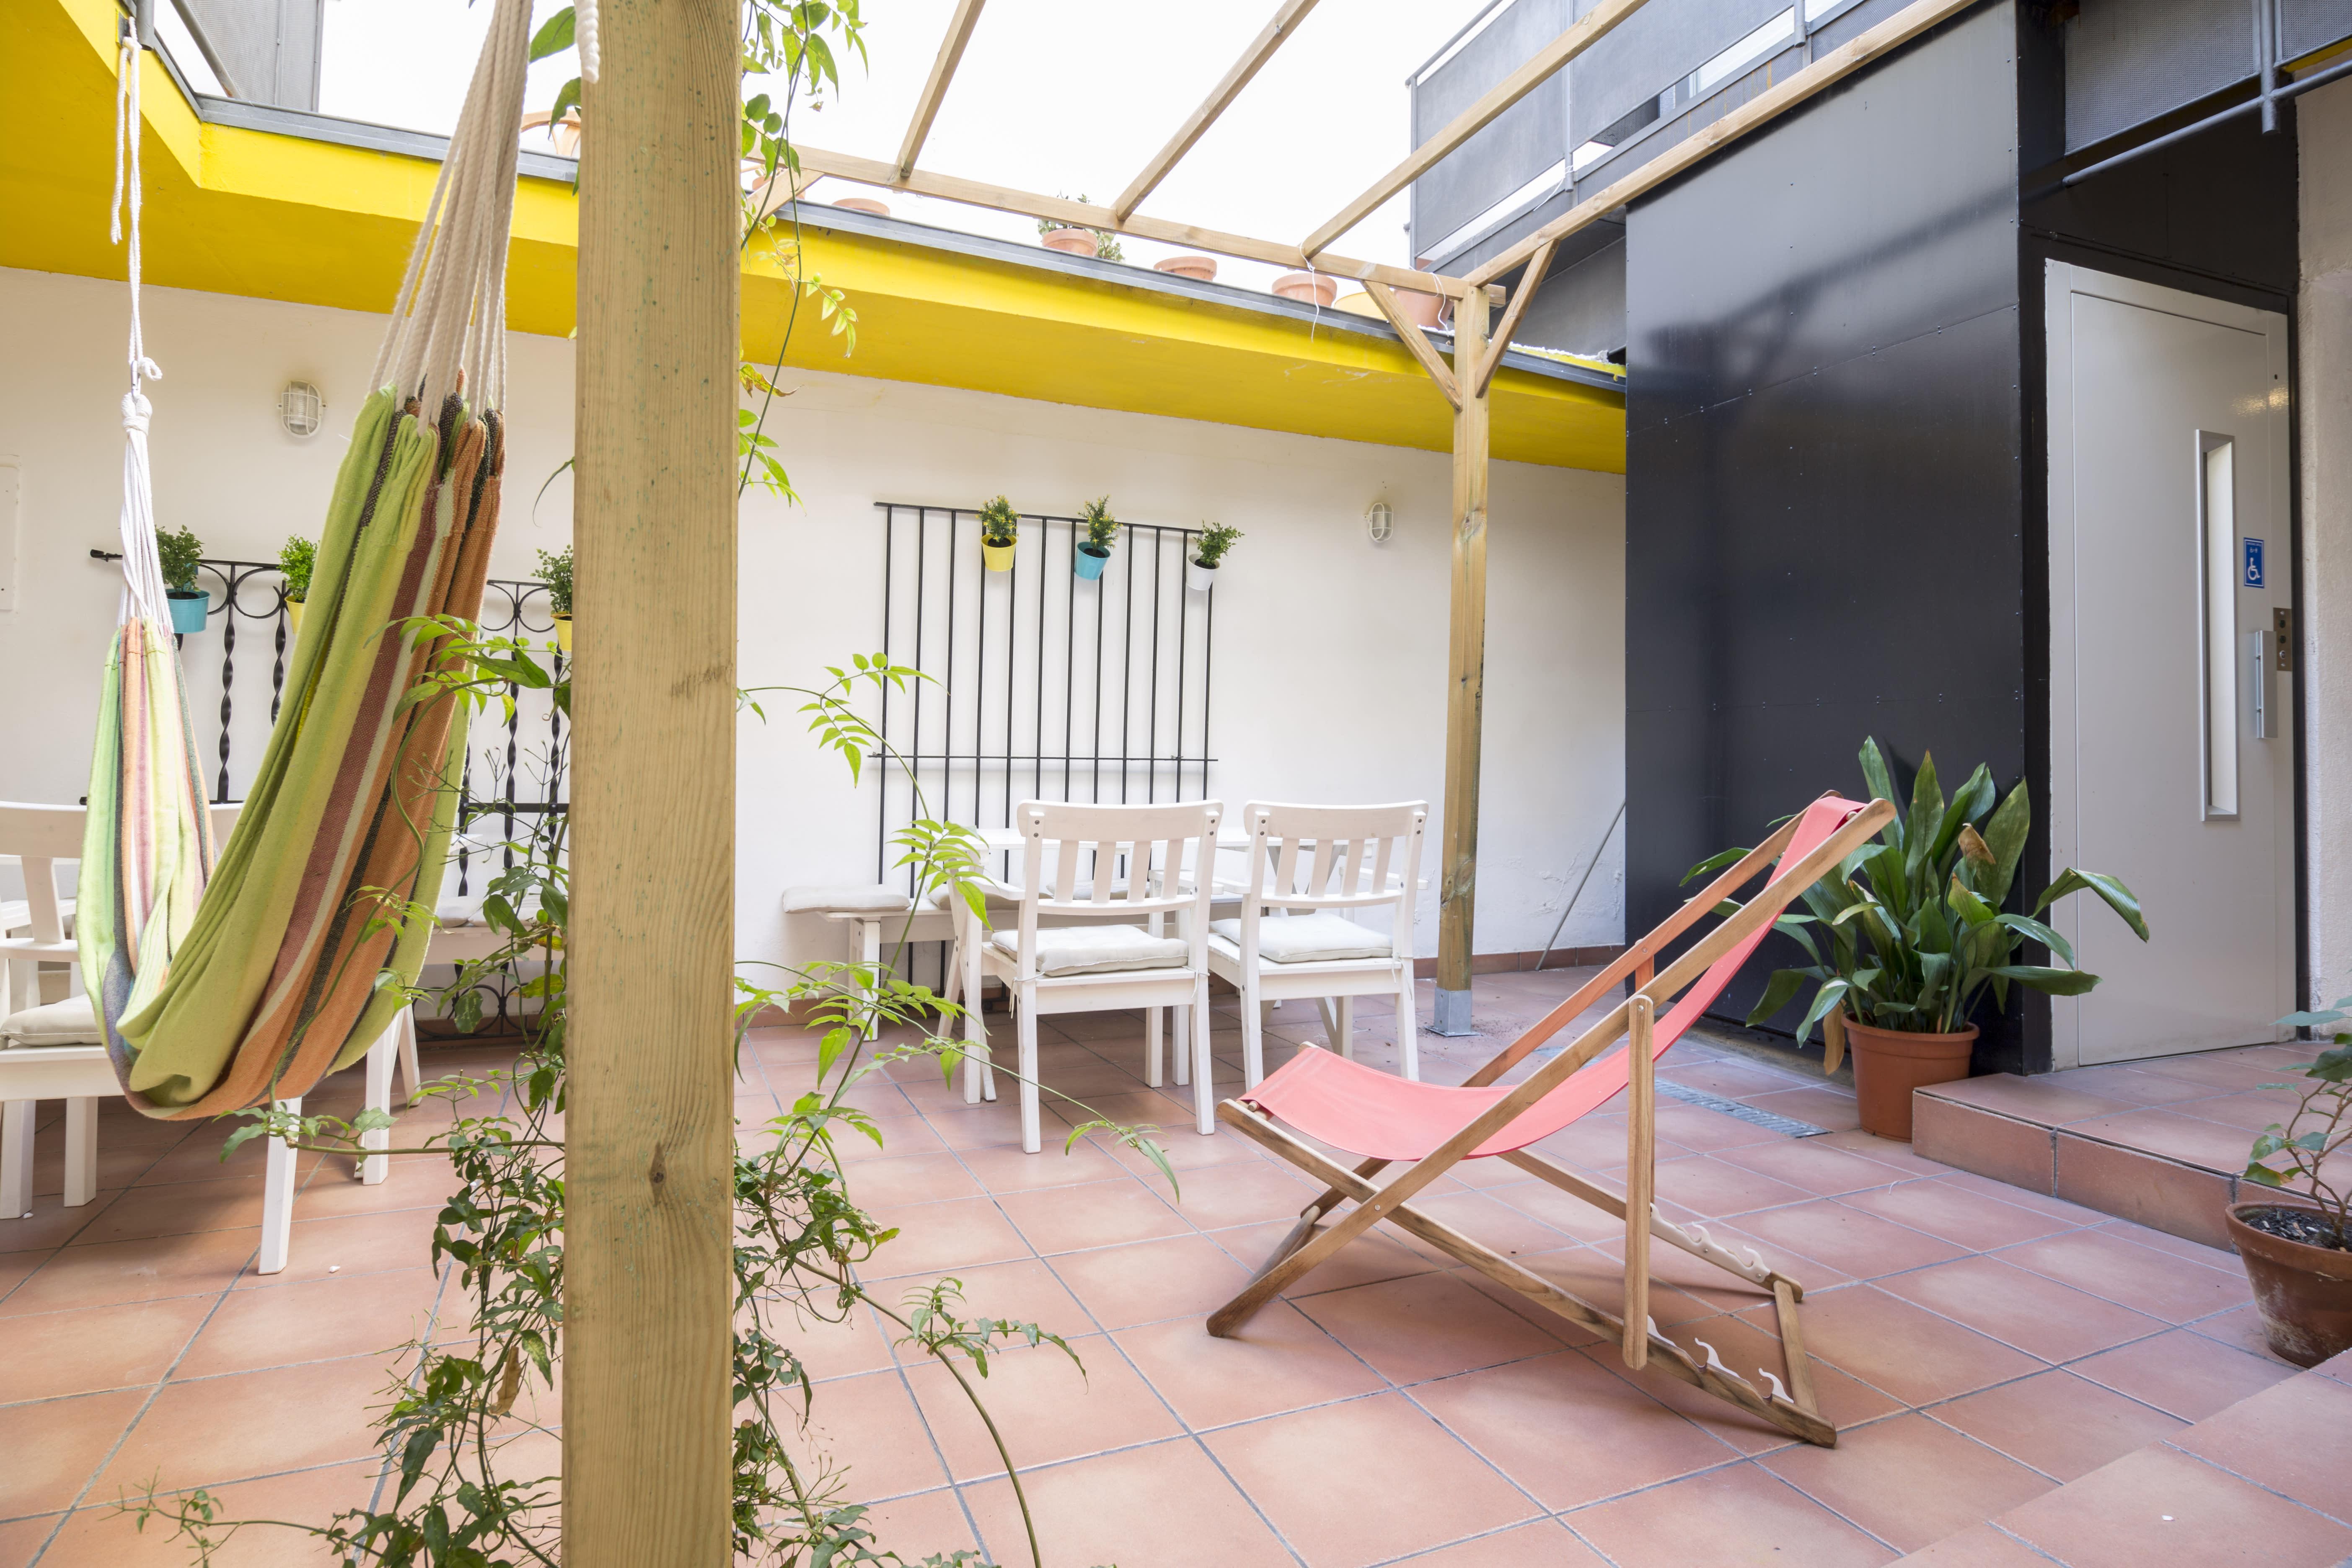 La Flor de Gaudi Hostel